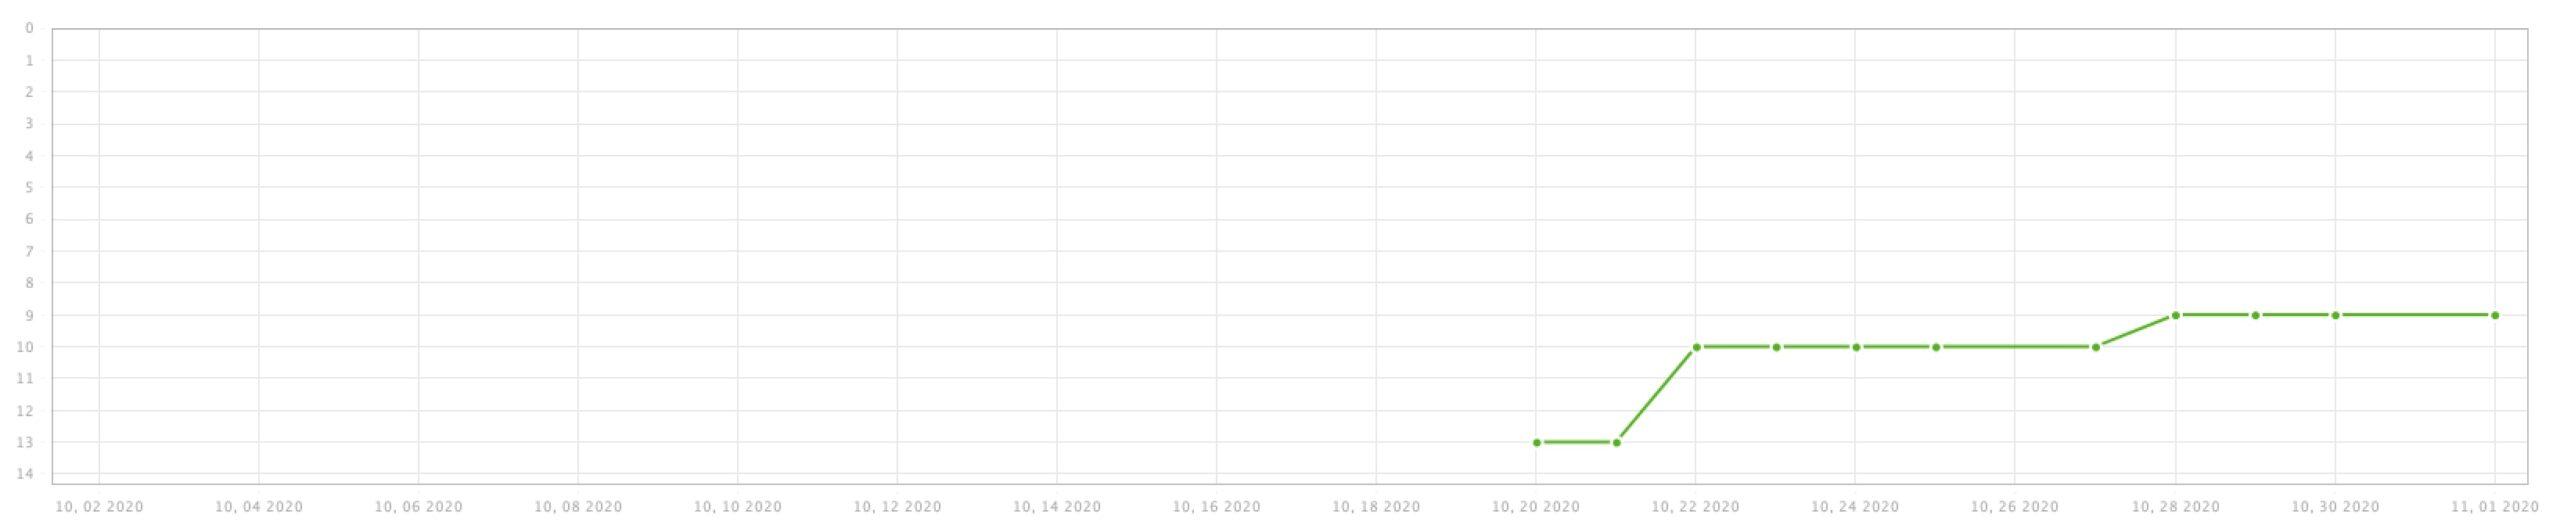 Rank Tracker|初回から上位に入り徐々に上がる記事